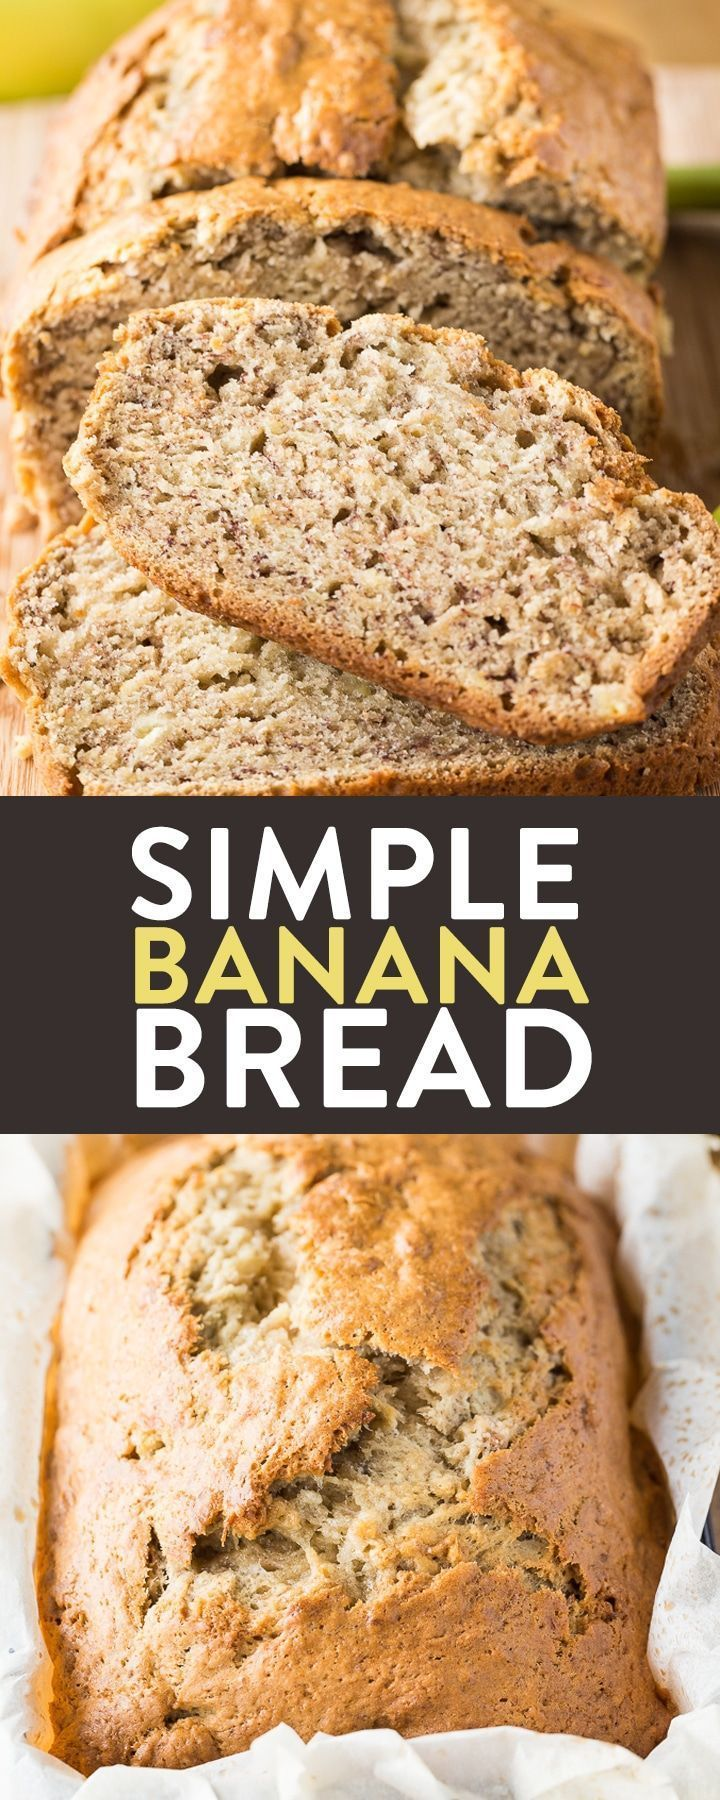 Simple Banana Bread Recipe The Bewitchin Kitchen Recipe Banana Bread Recipes Leftover Banana Recipes Easy Banana Bread